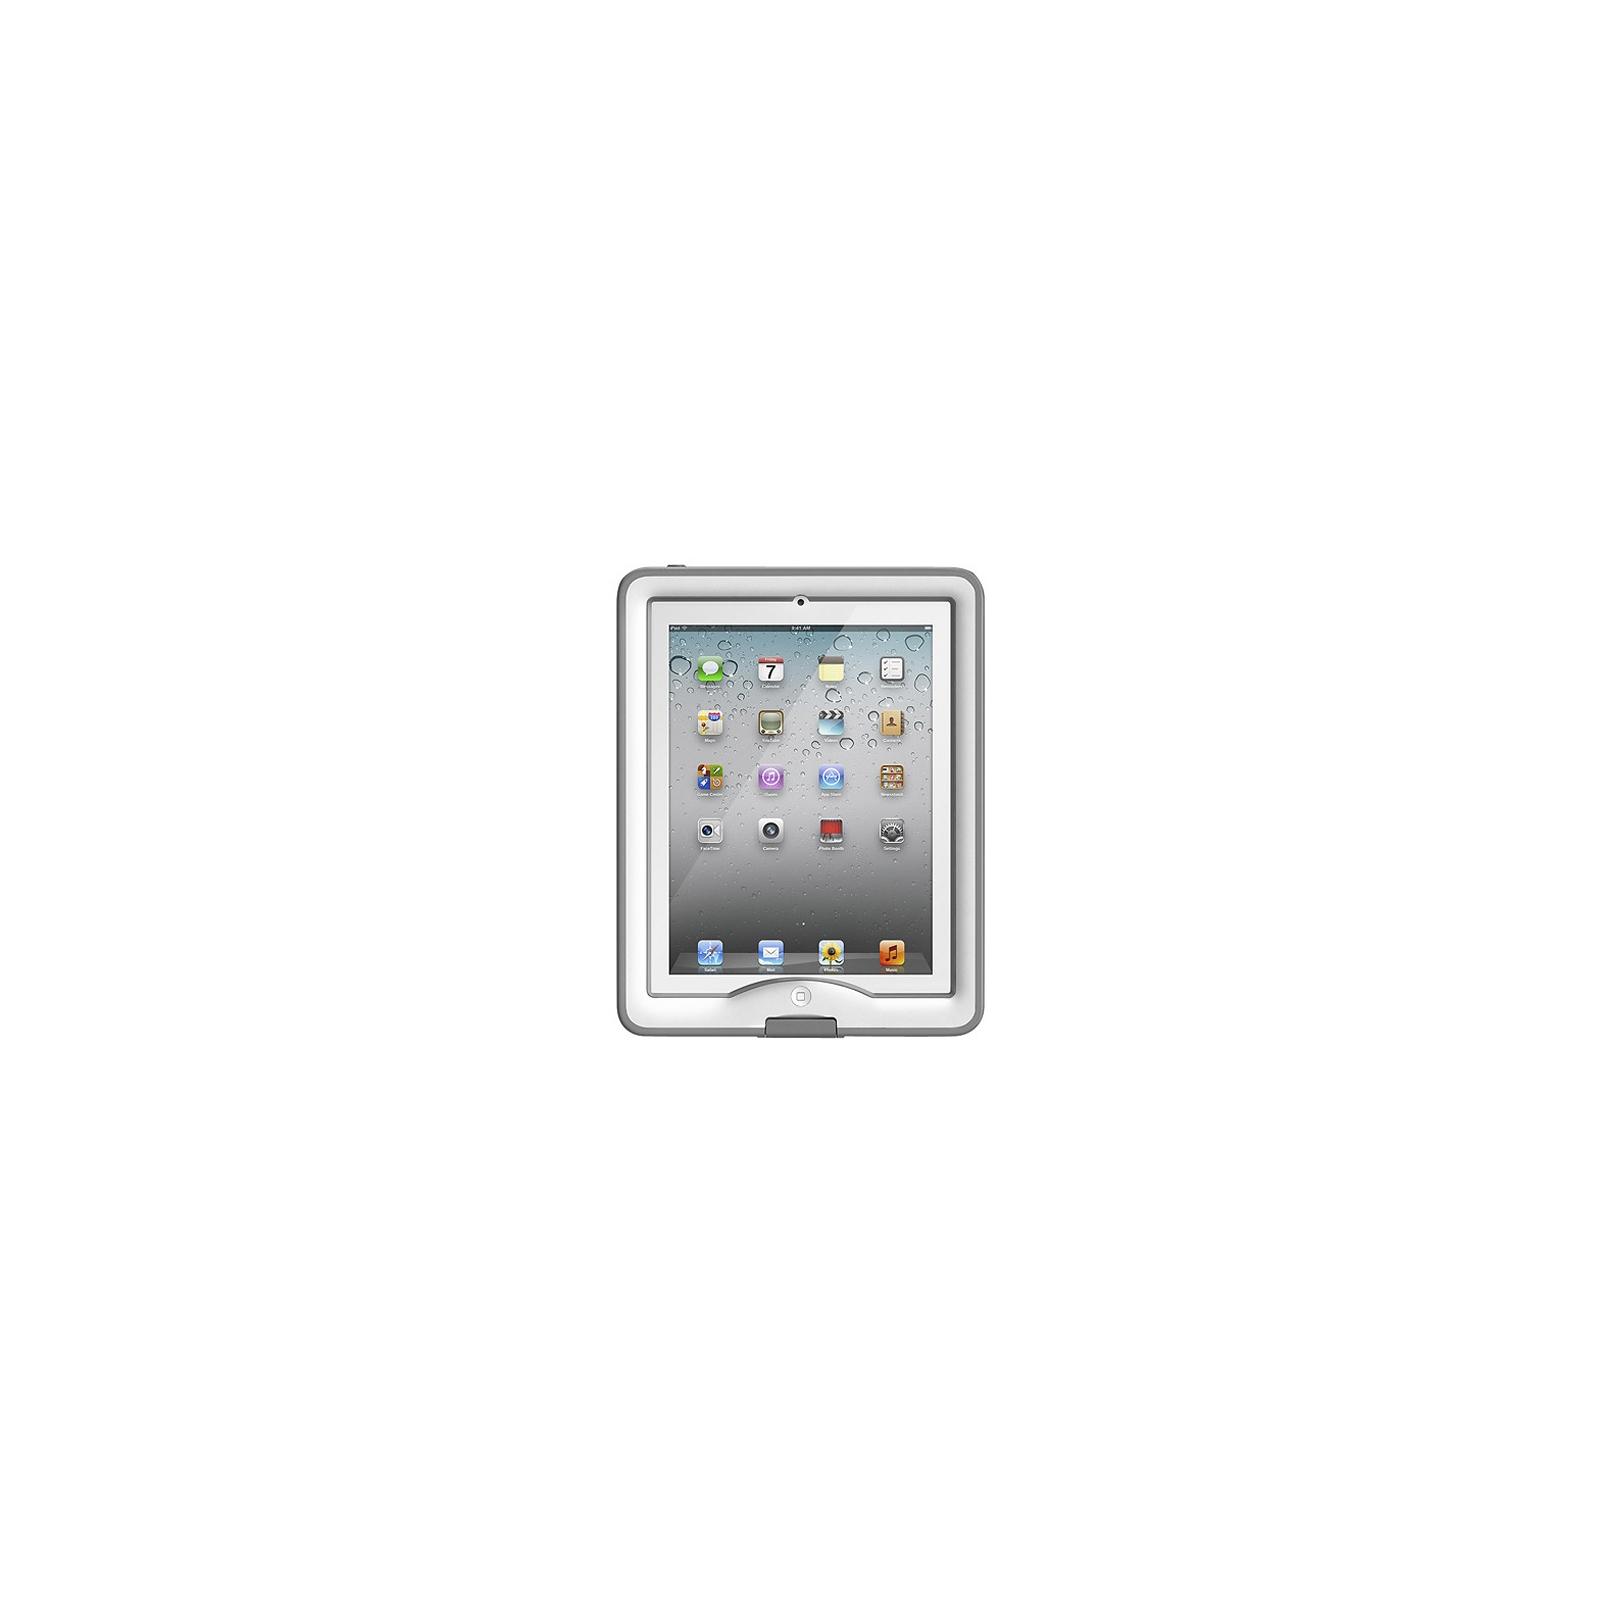 Чехол для планшета Belkin iPad4 LifeProof Case & Cover/Stand (1109-02)